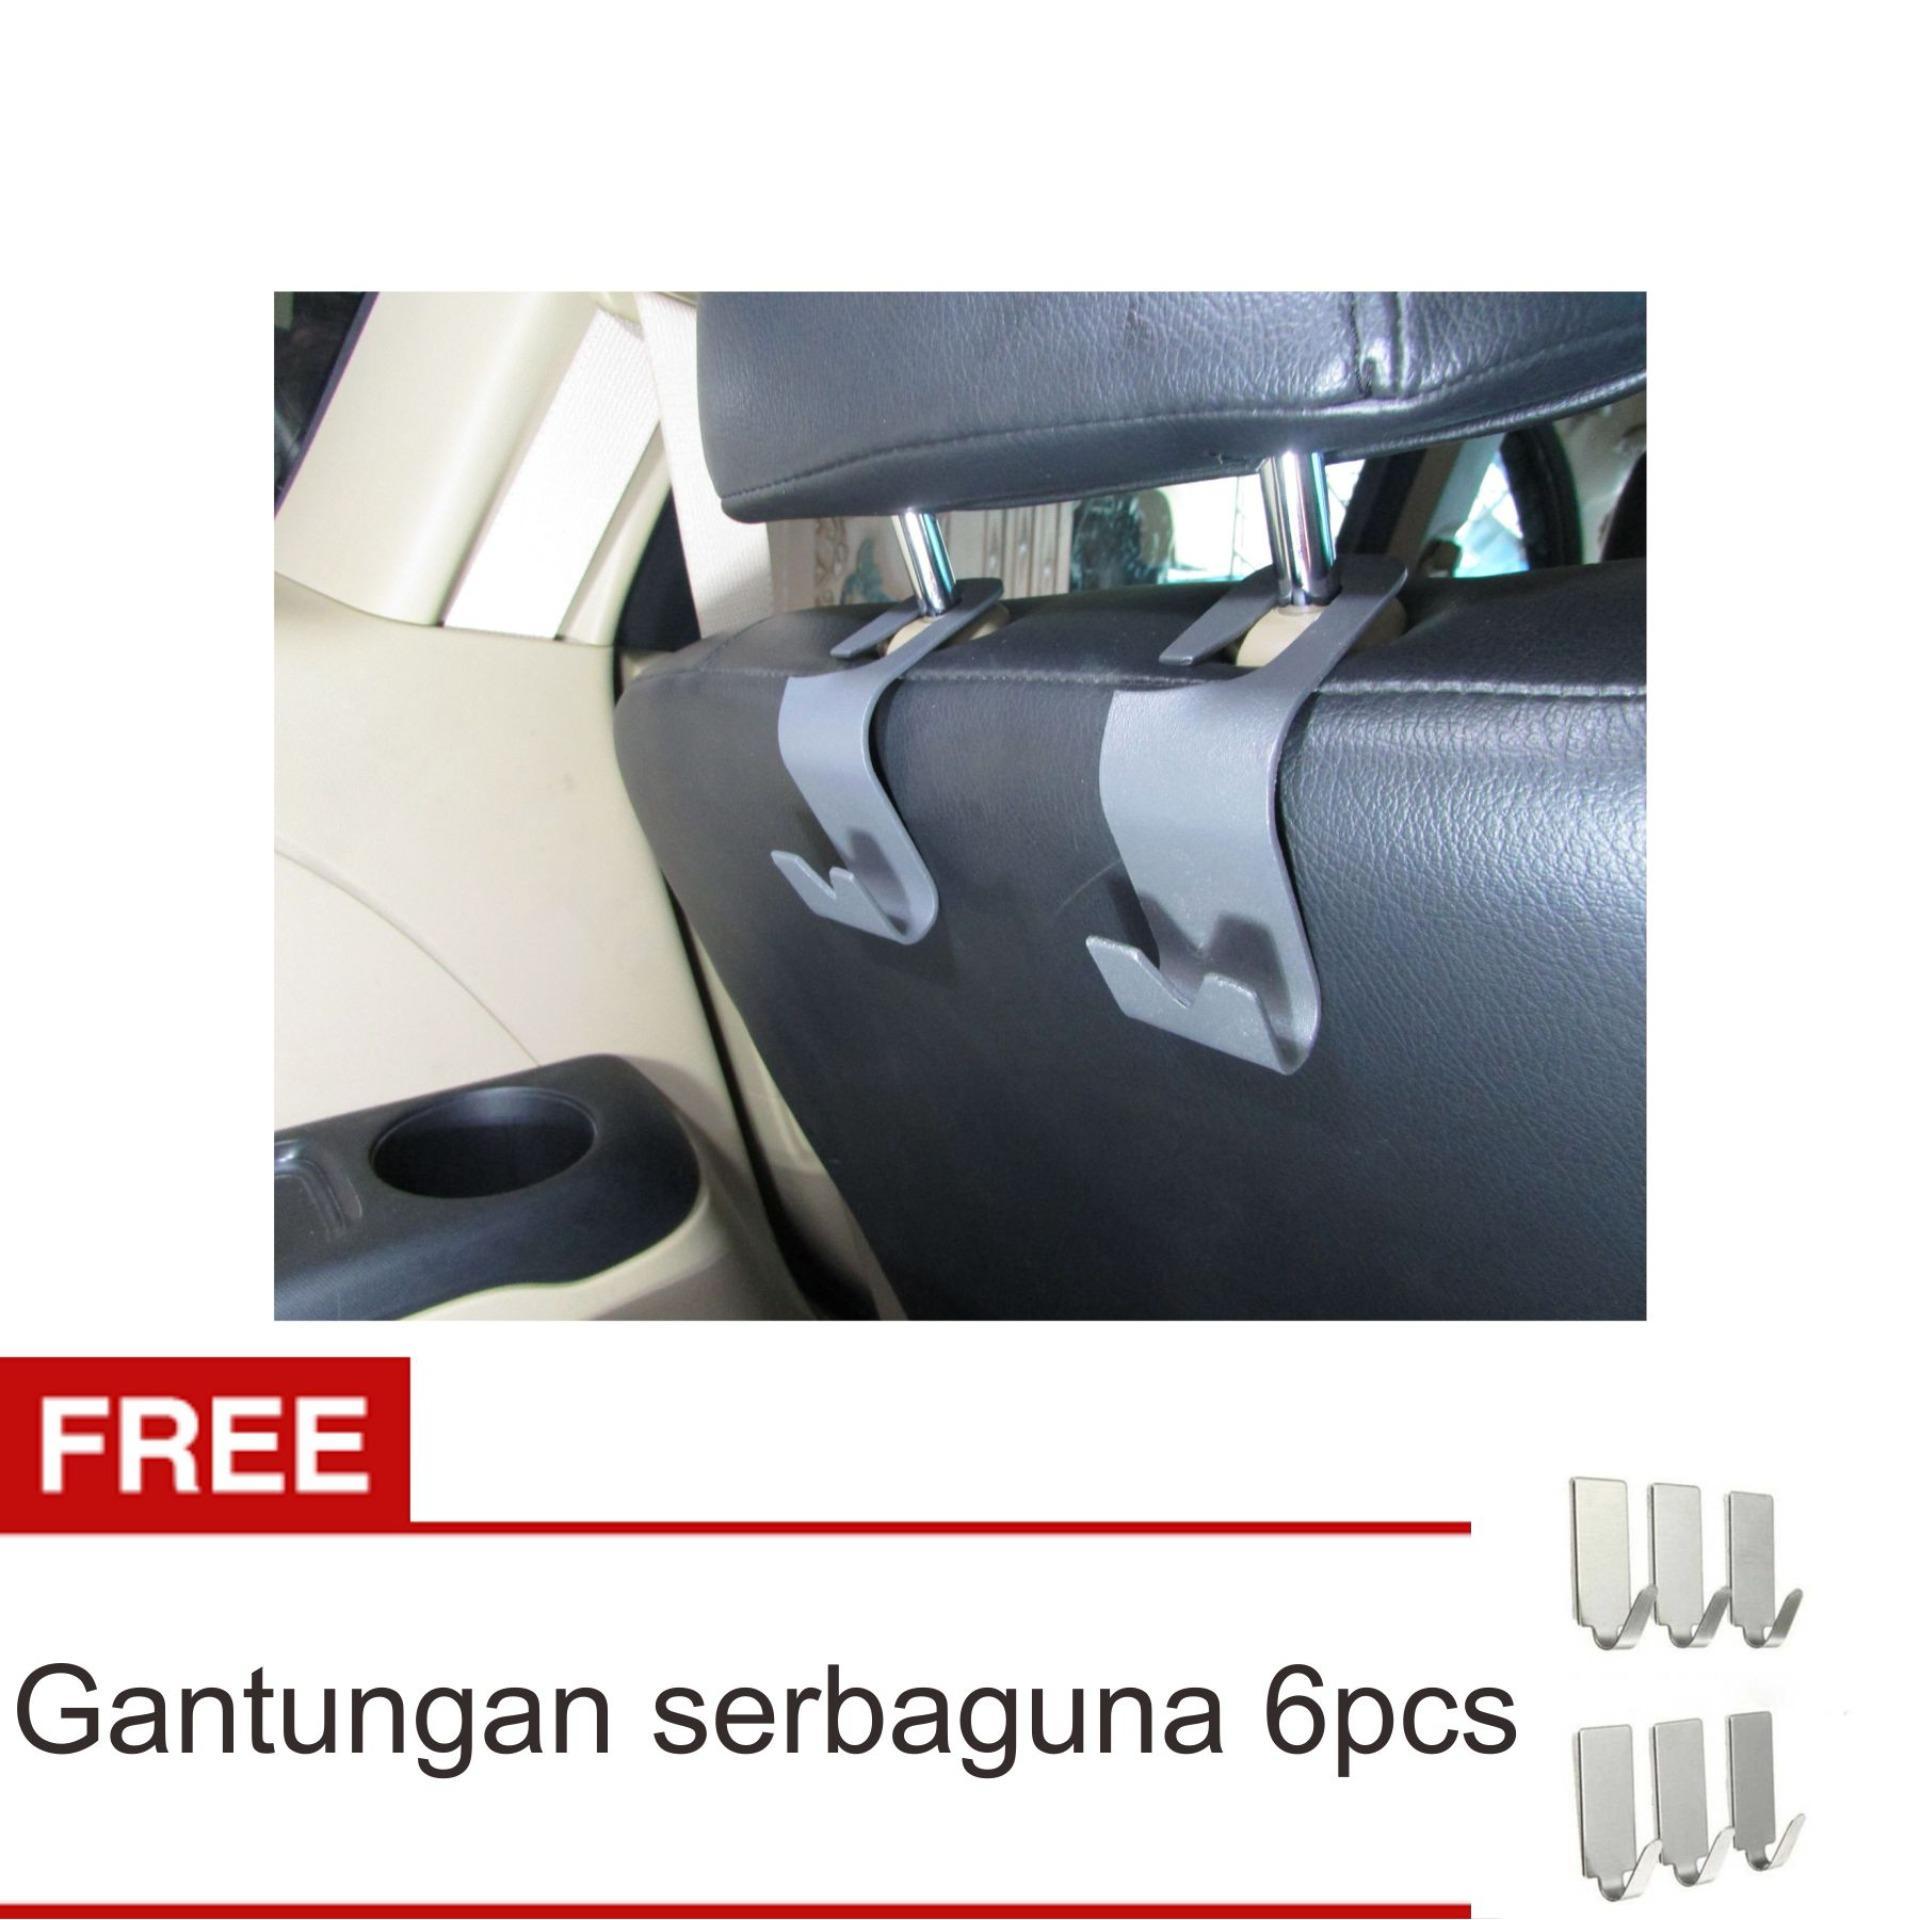 Hot Deals Lanjarjaya Mobil Kendaraan Back Seat Headrest Organizer Hanger Storage Hook untuk Belanjaan Bag Handbag